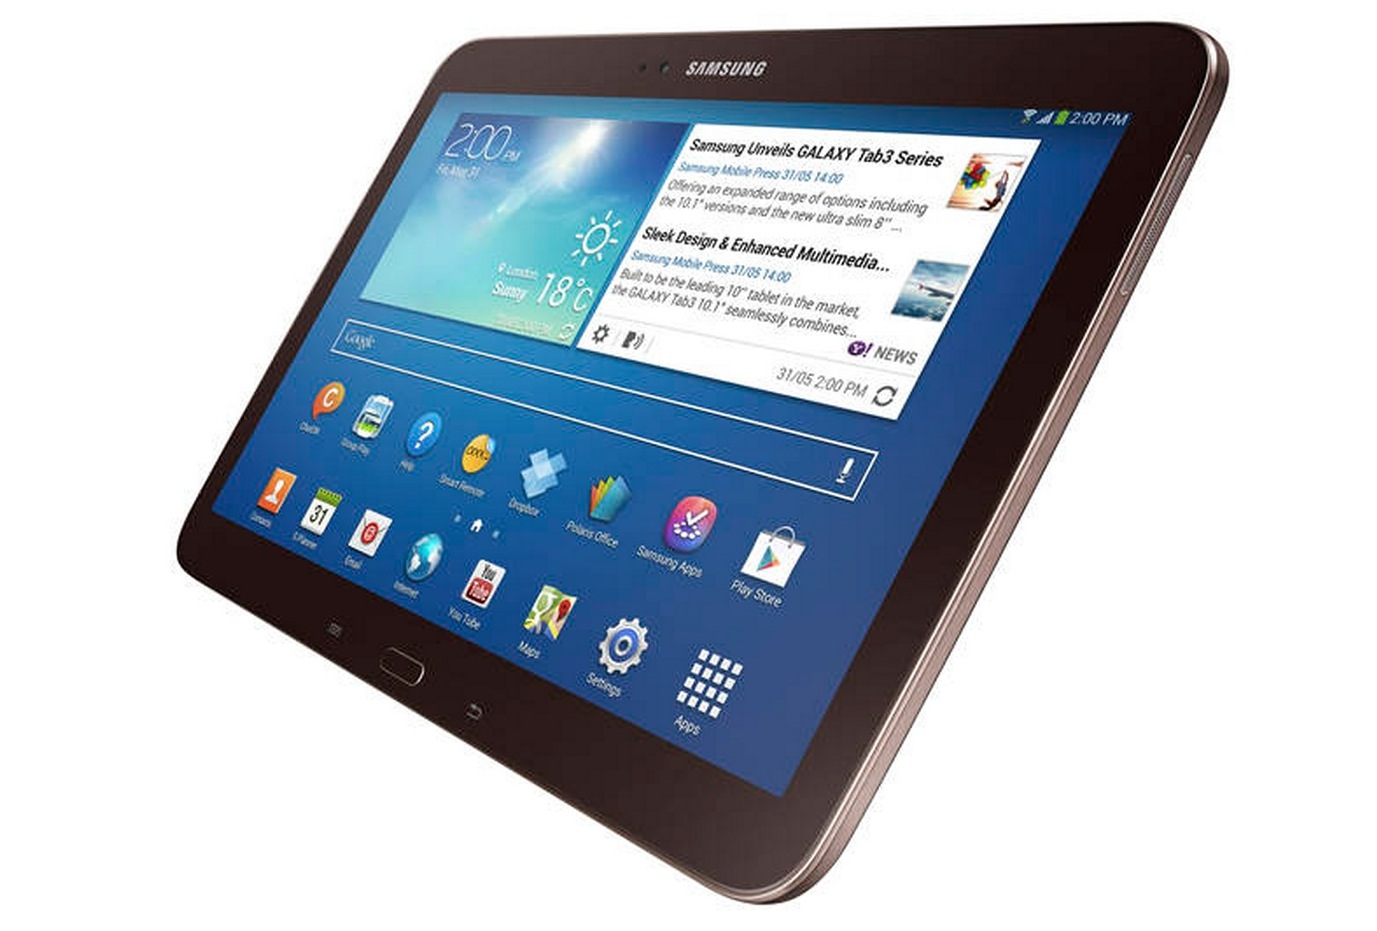 Samsung Galaxy Tab 3 10.1 - характеристики